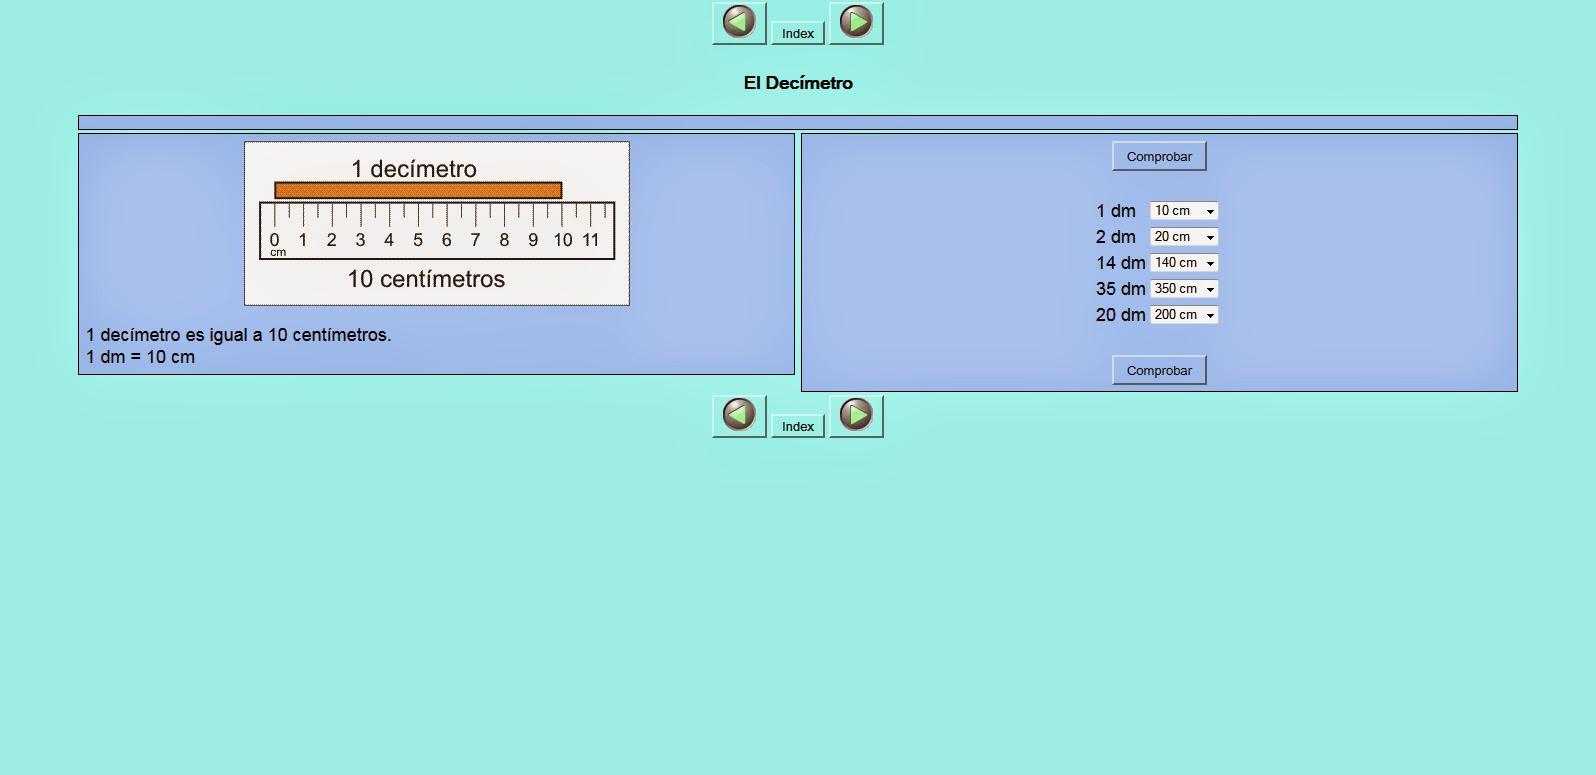 http://calasanz.edu.gva.es/7_ejercicios/matematicas/mate3pri/12_medida01.html